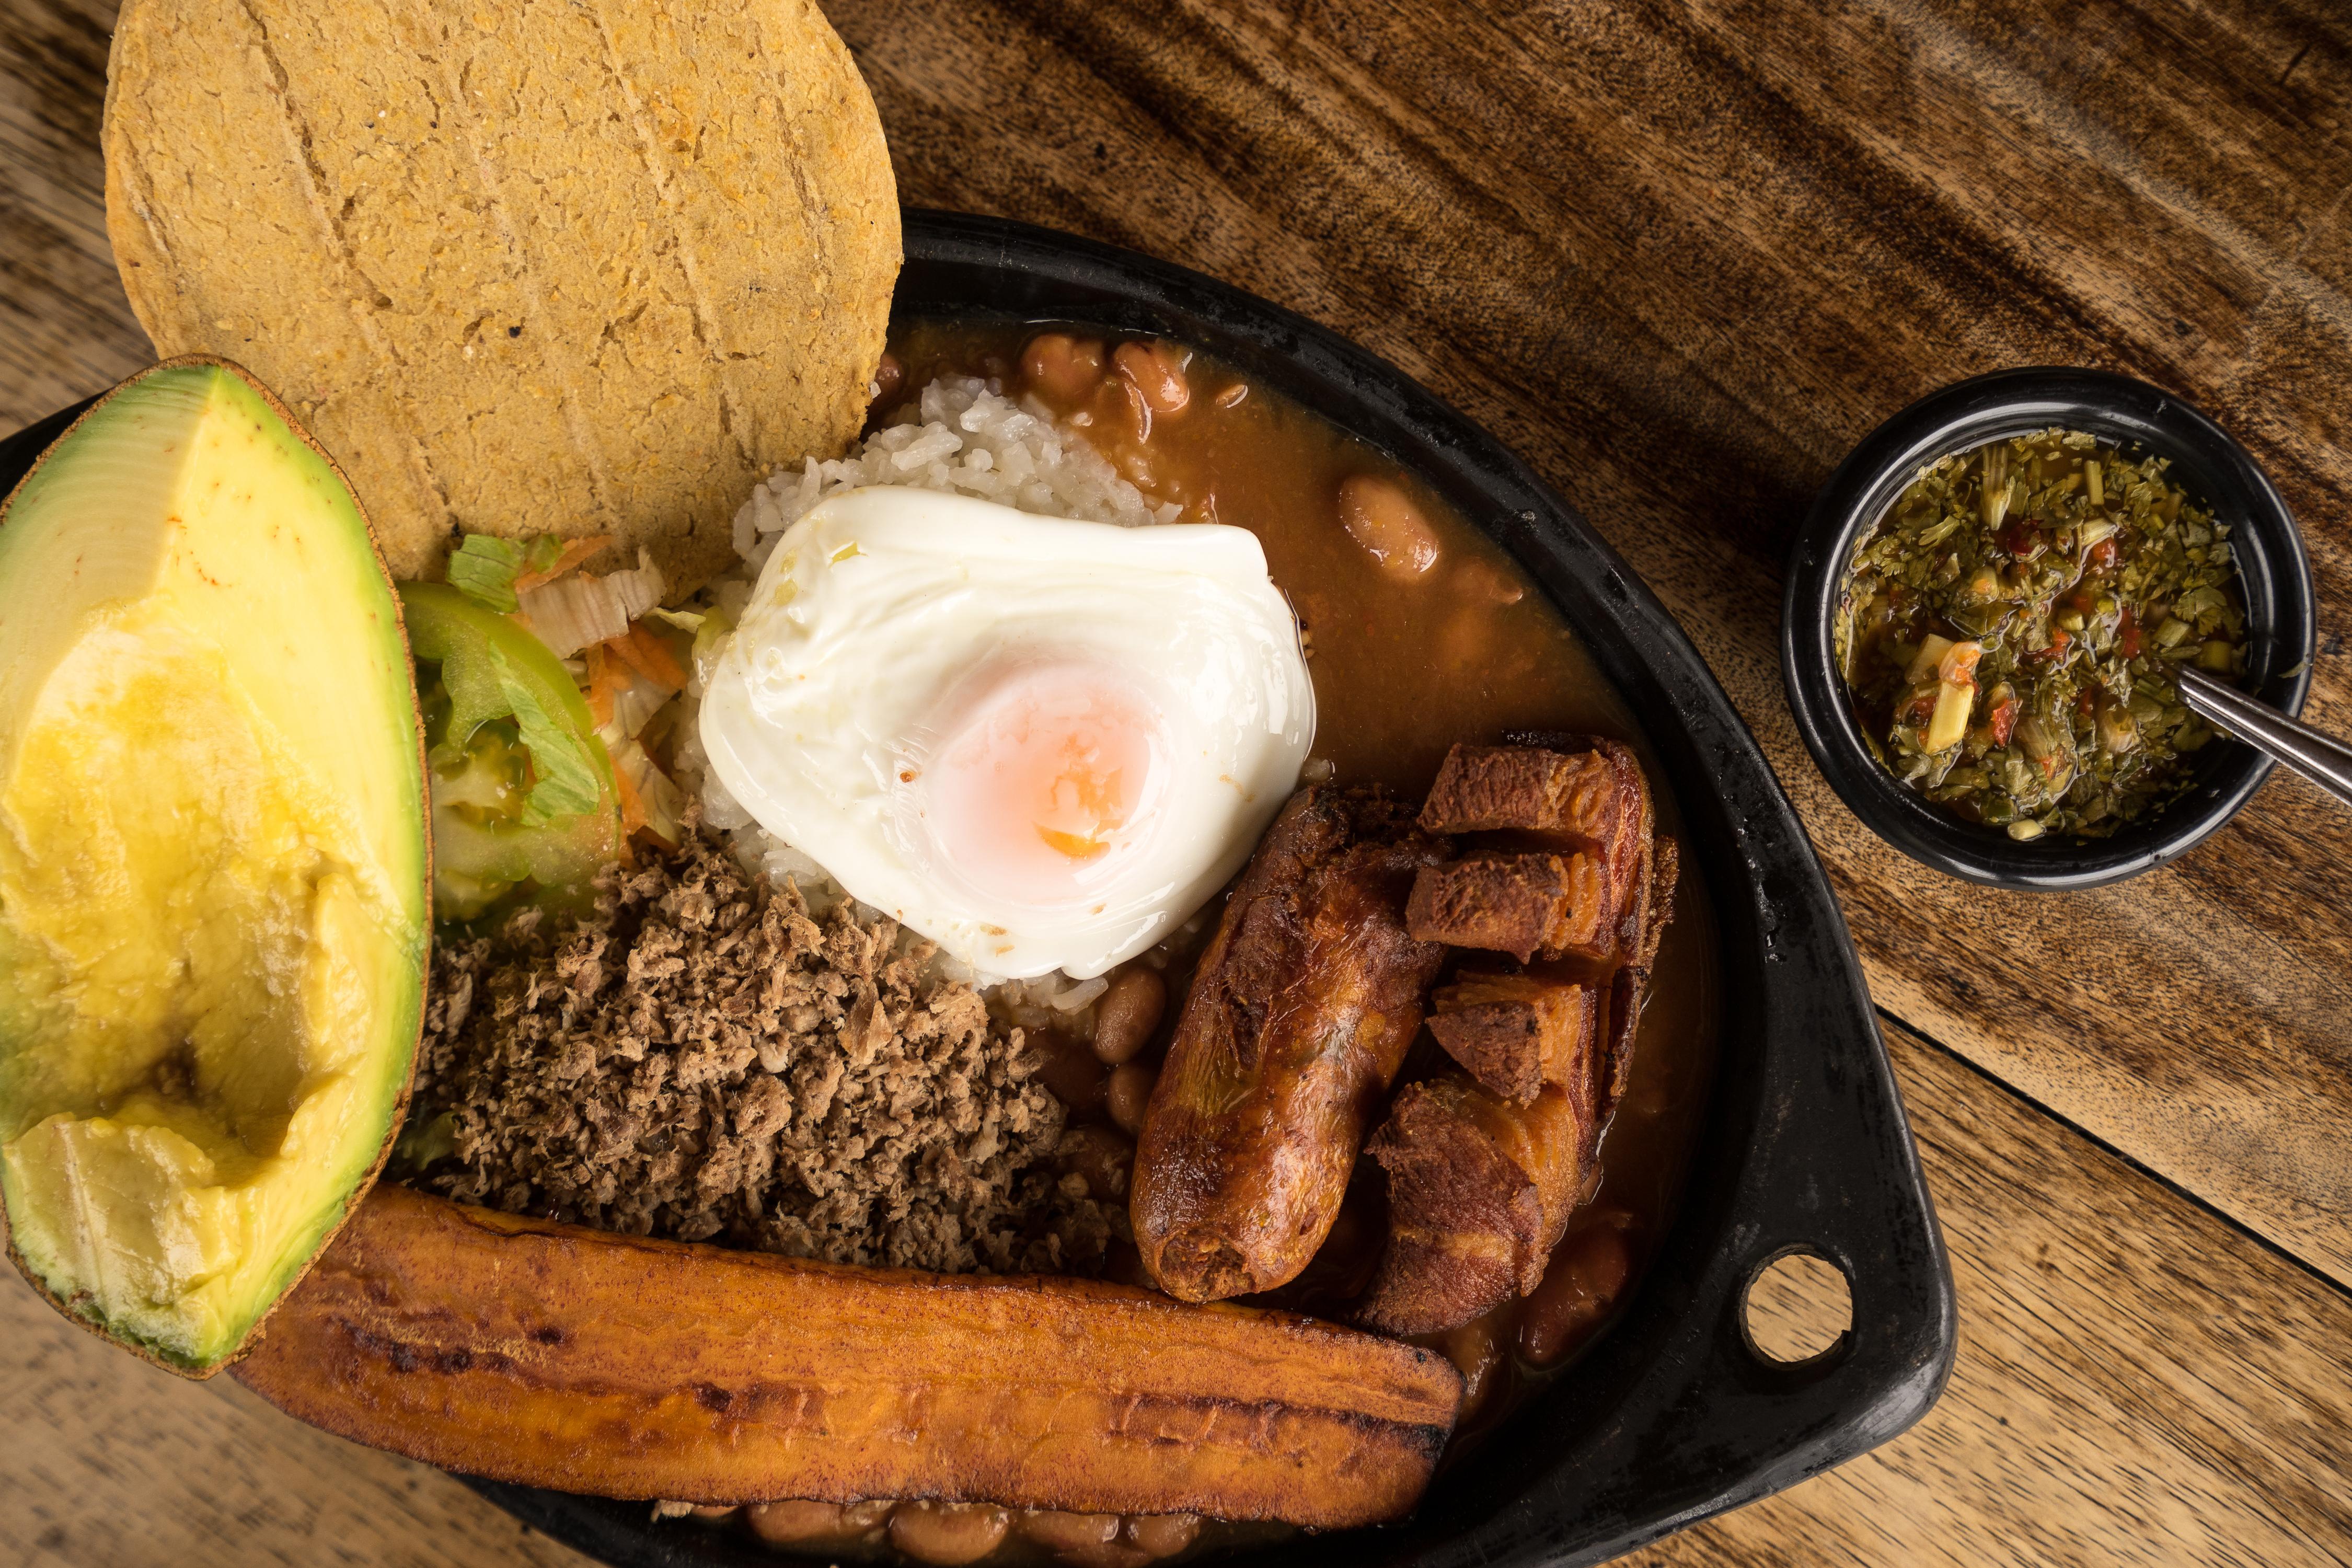 paisa bandeja traditional Colombian food